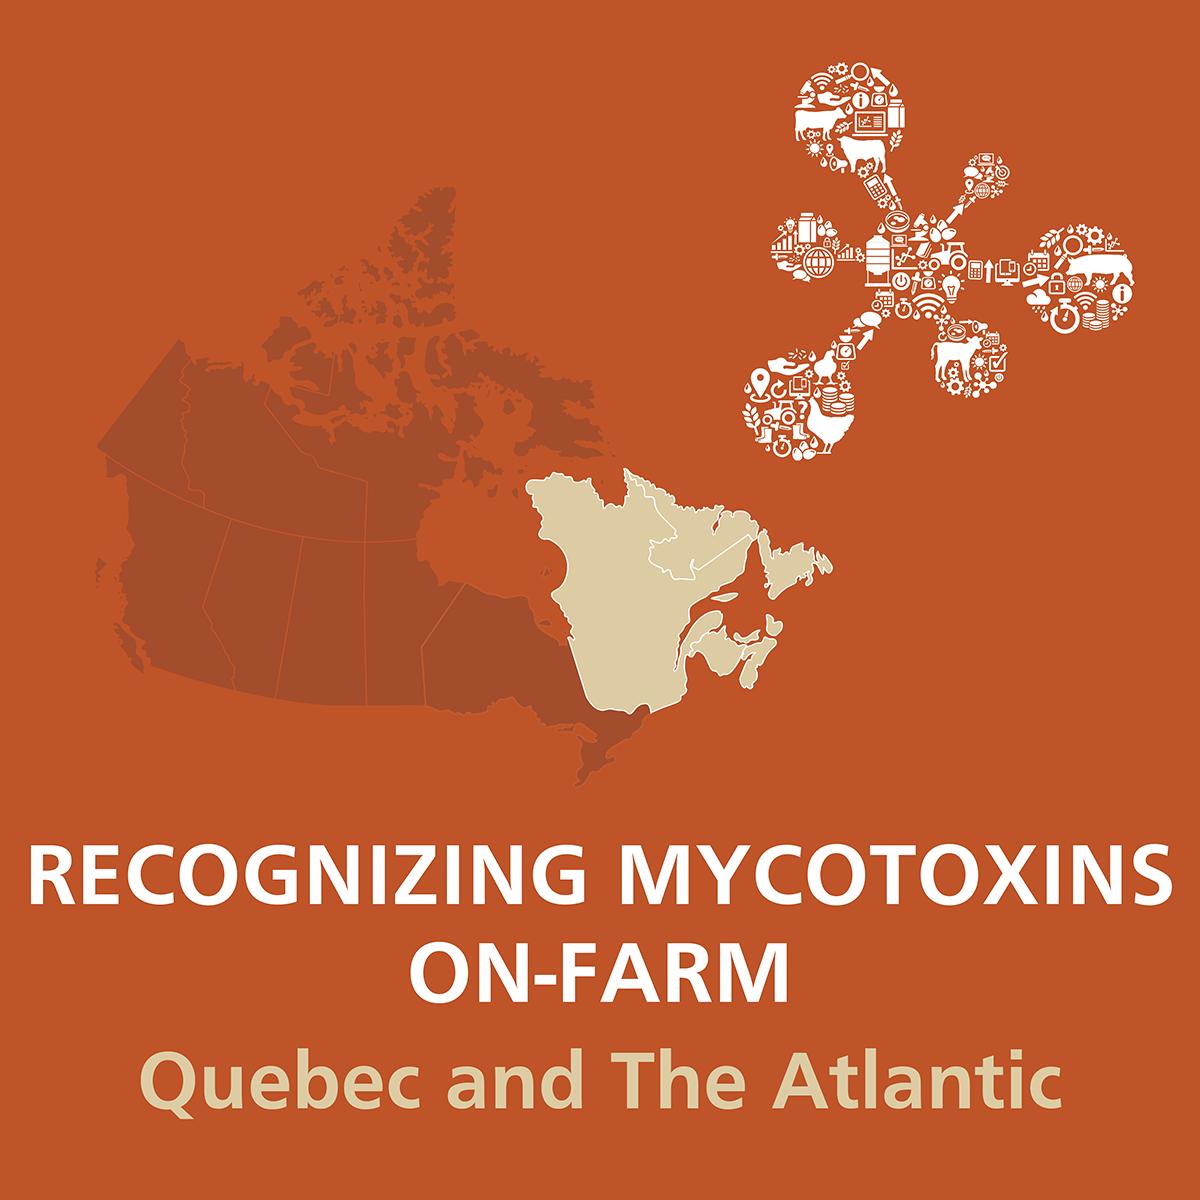 Recognizing-Mycotoxins-On-Farm